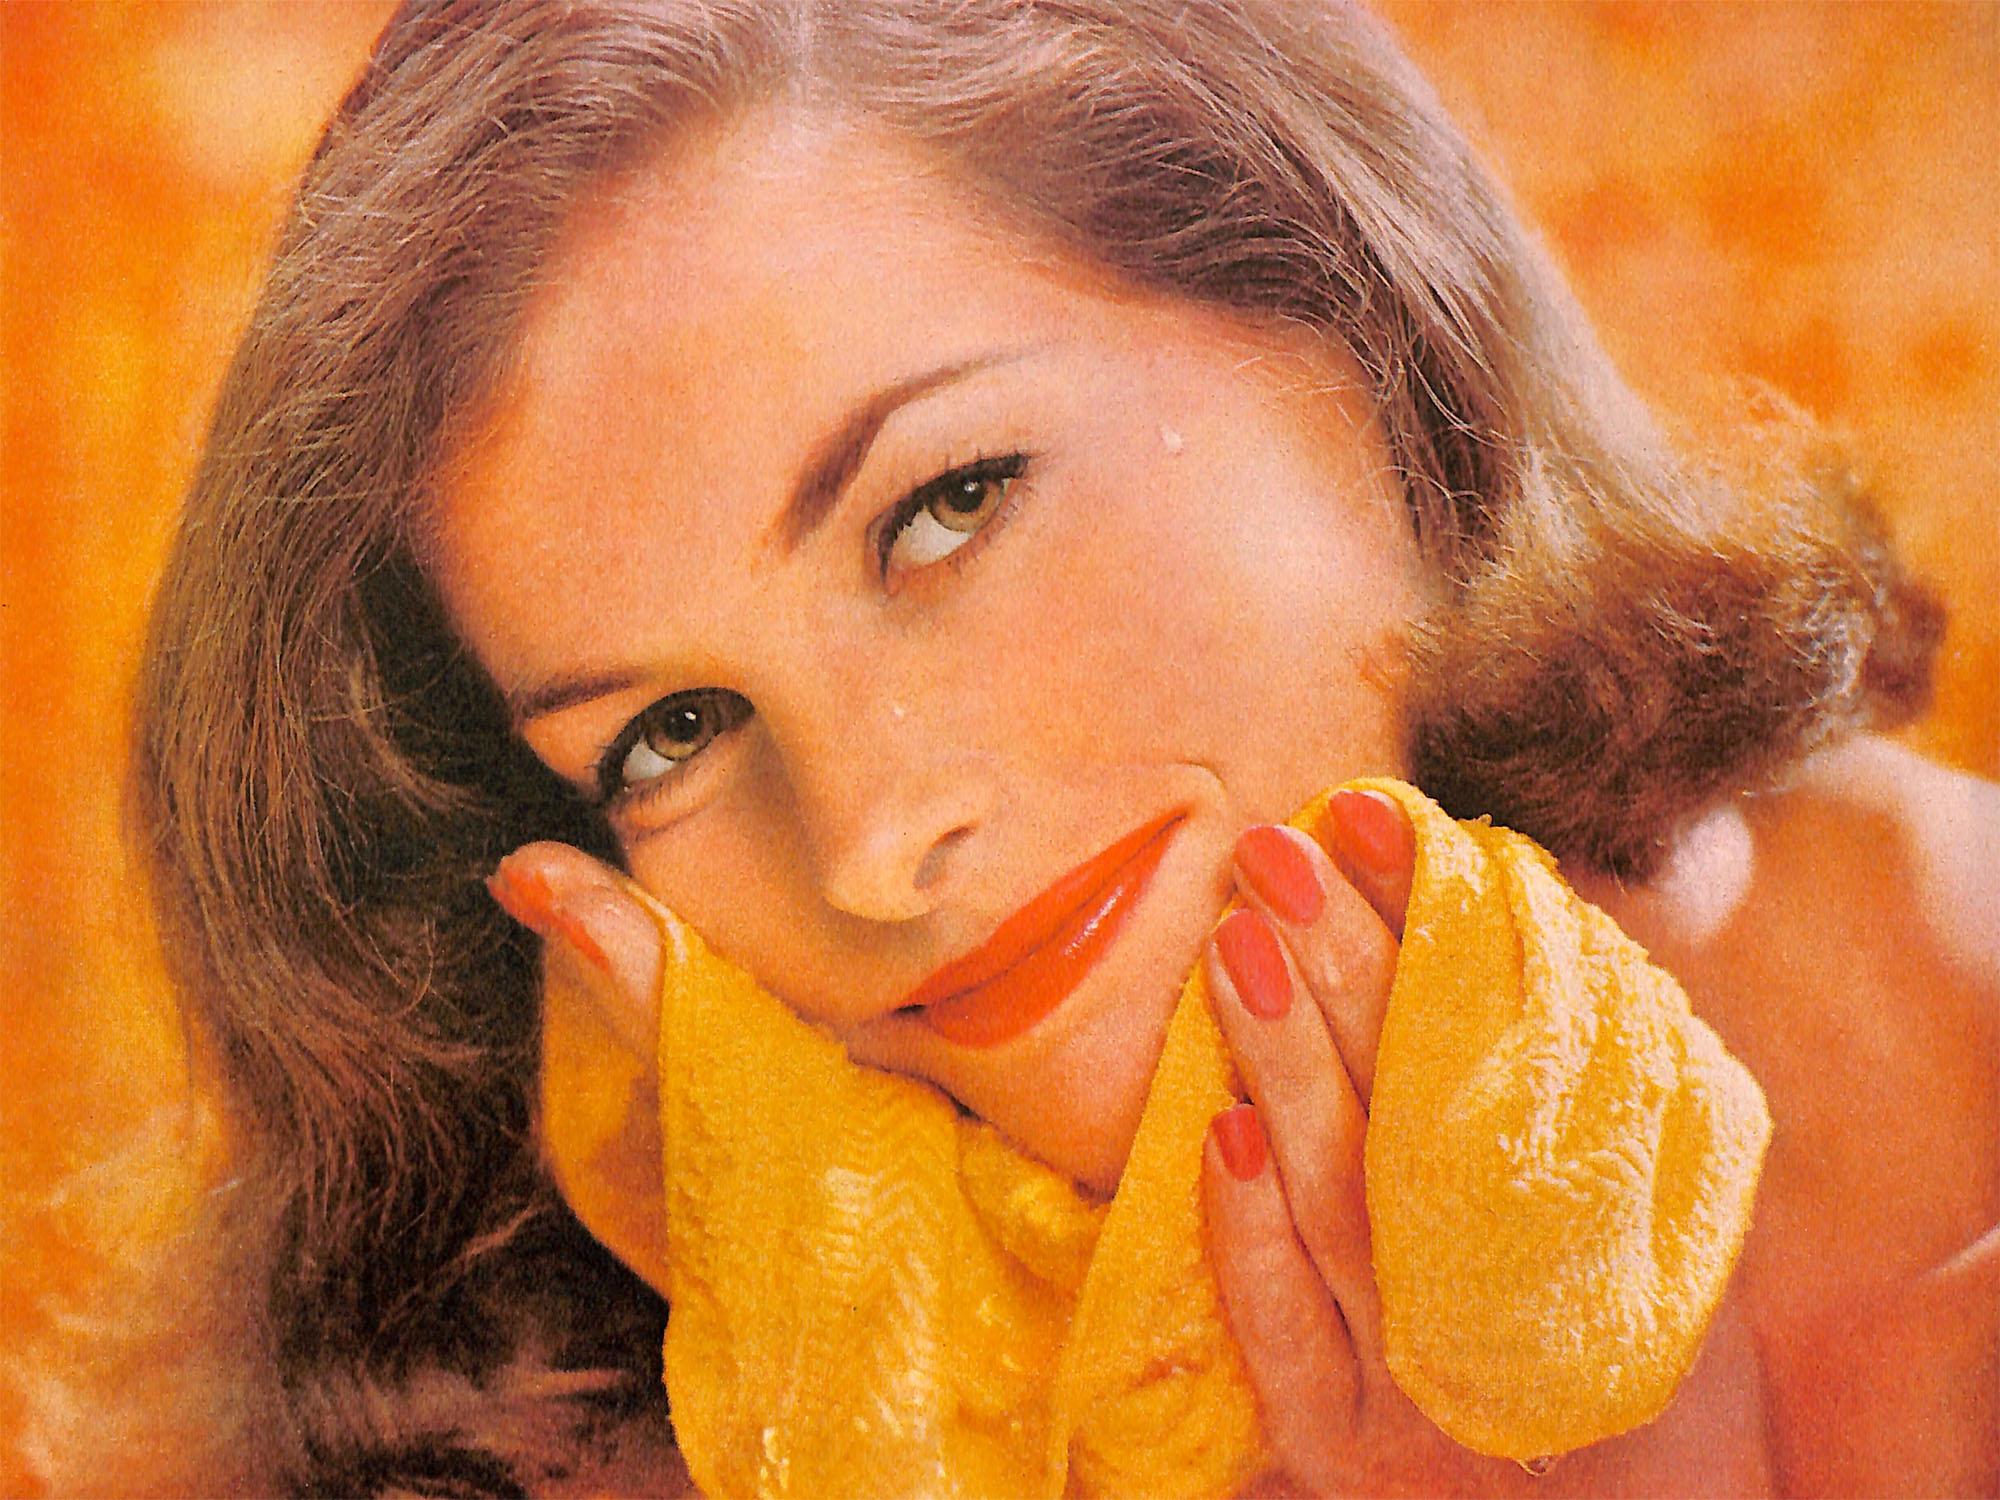 Vintage Beauty Ad for Noxzema